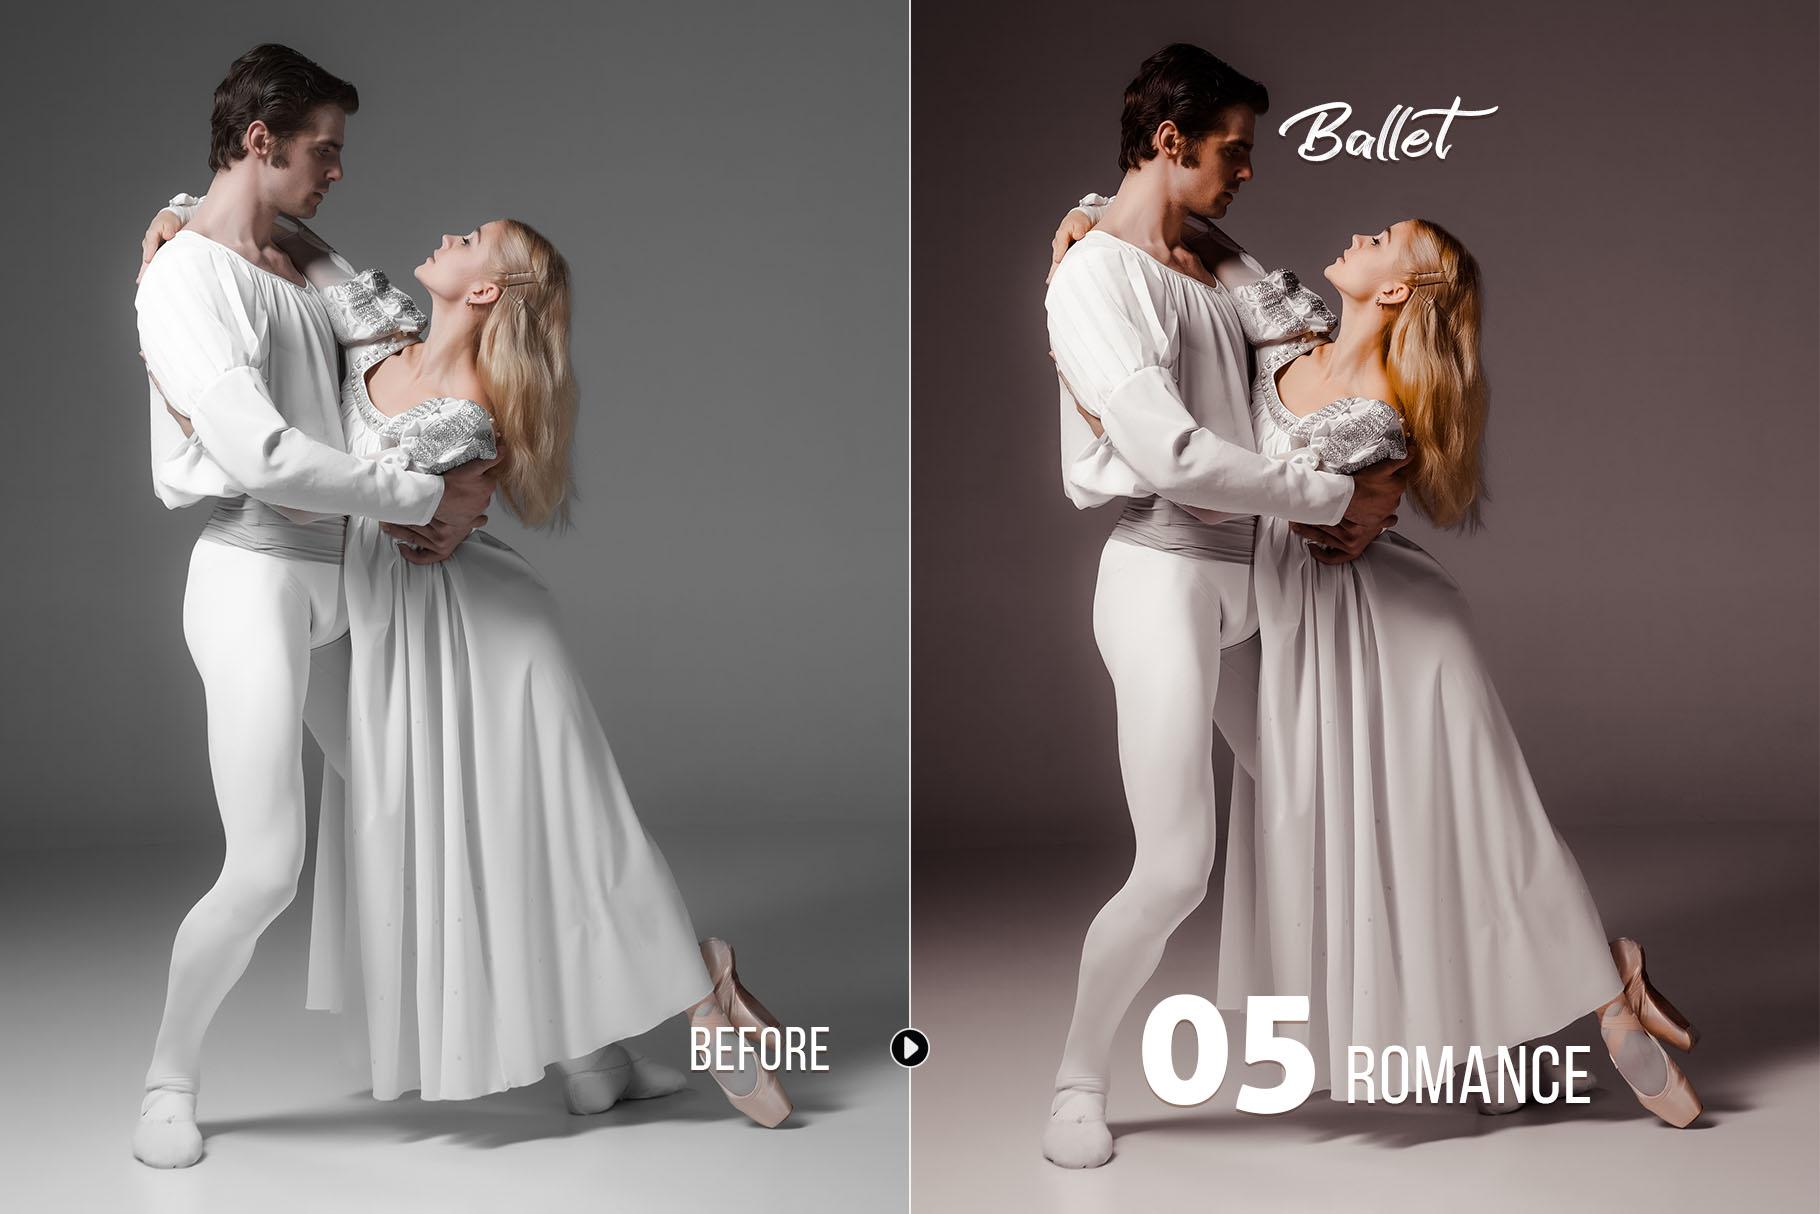 Ballet_preview_05